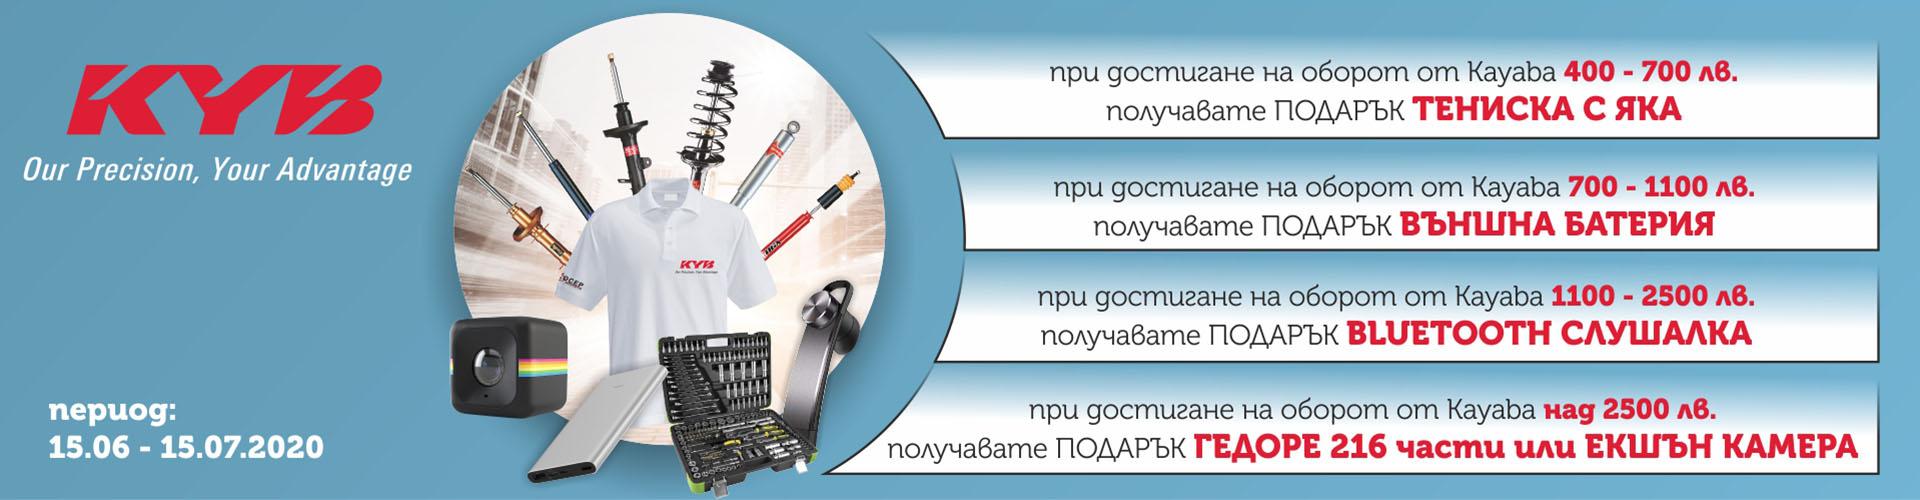 promo_kayaba_15.06.2020-15.07.2020_banner.jpg